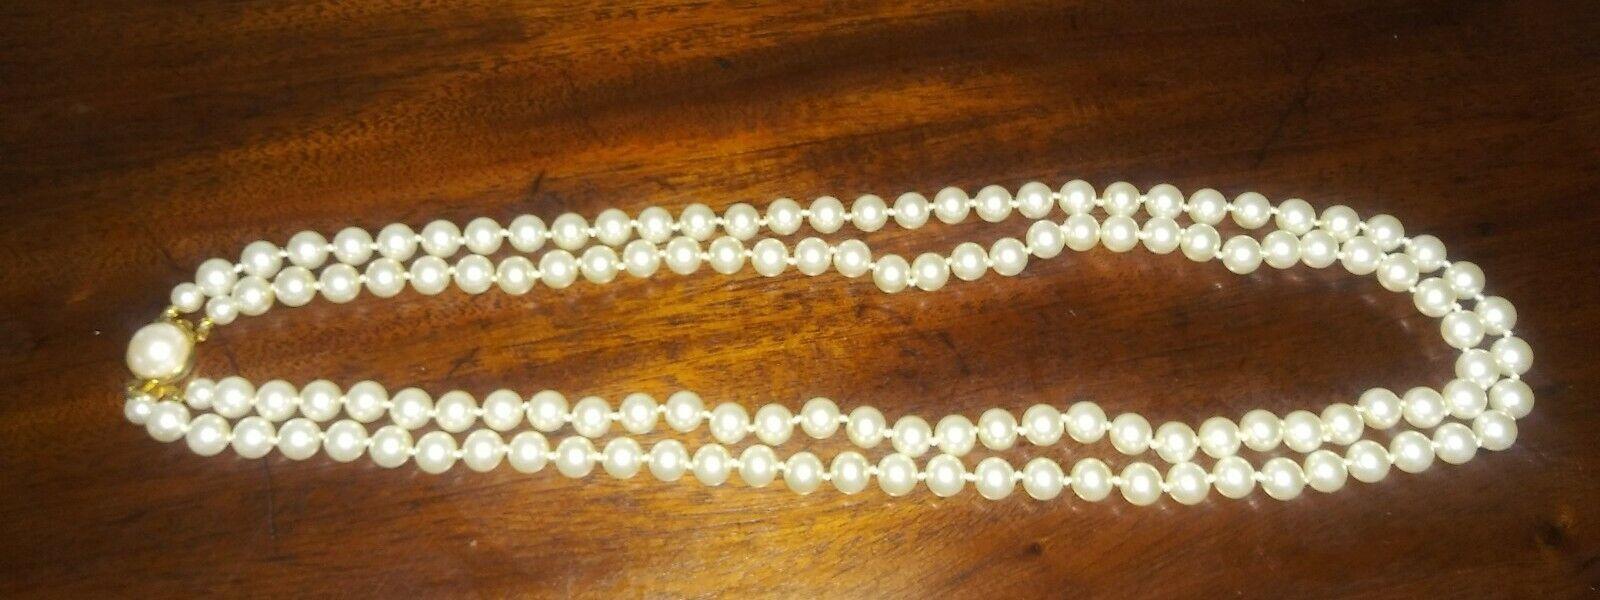 60s 70s mid century Asain bohemian boho orange beads single strand Vintage white faux pearl necklace gold tone large floral beads